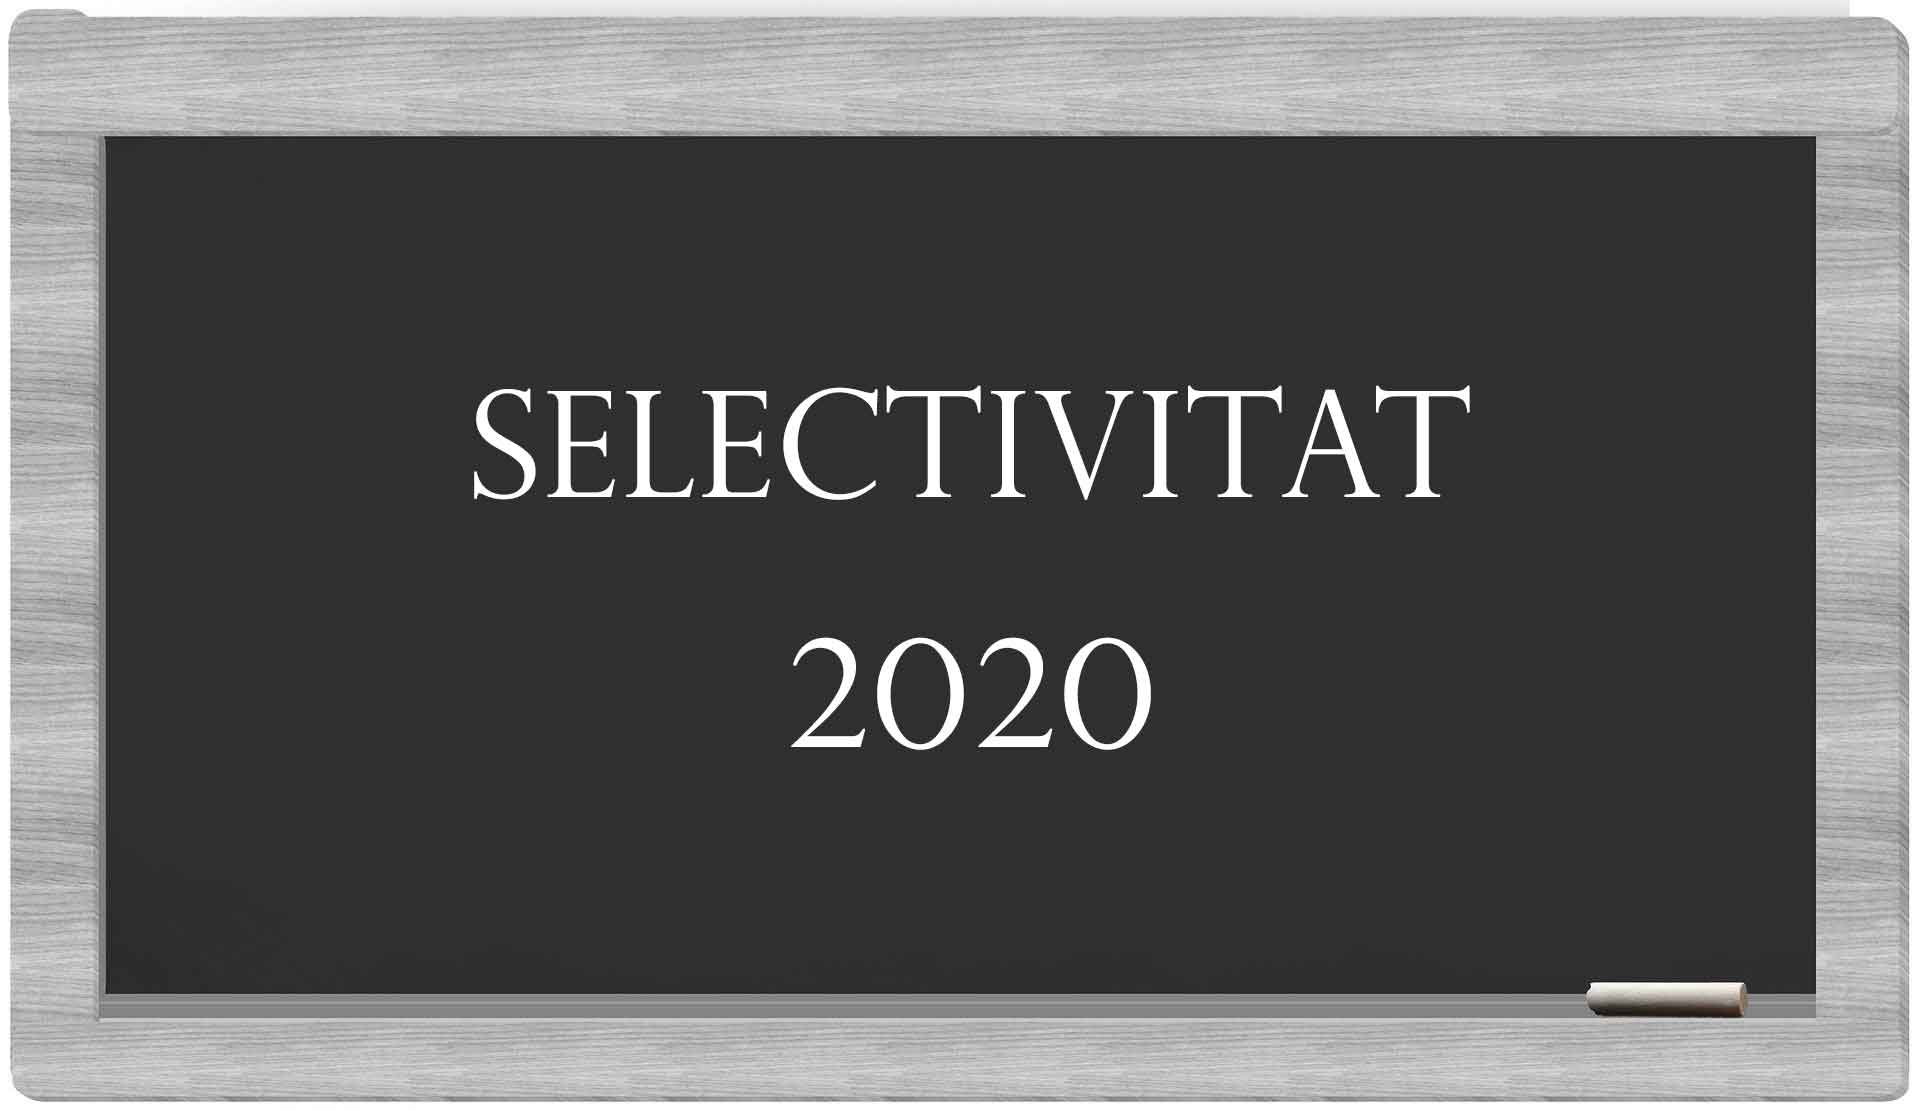 SELECTIVITAT